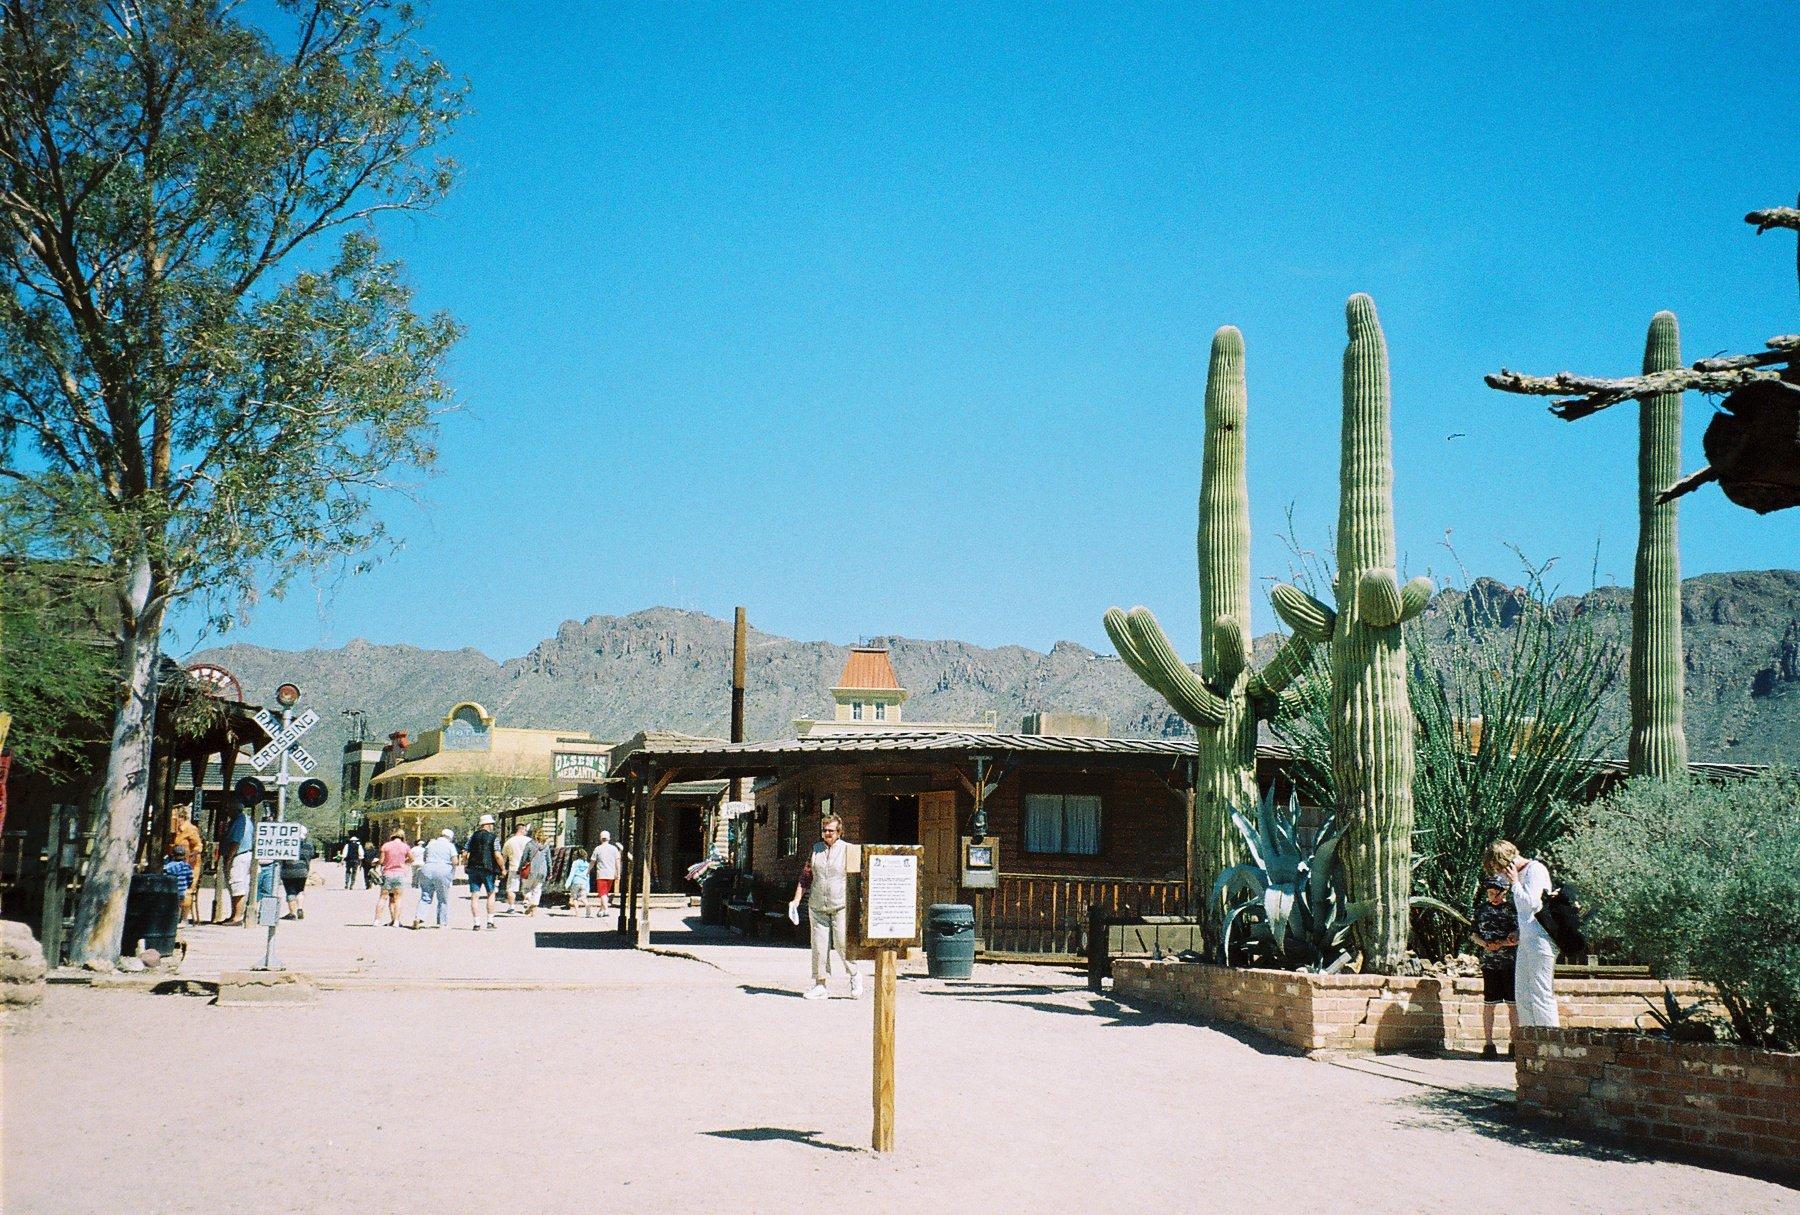 Faking Arizona at Old Tucson Studios